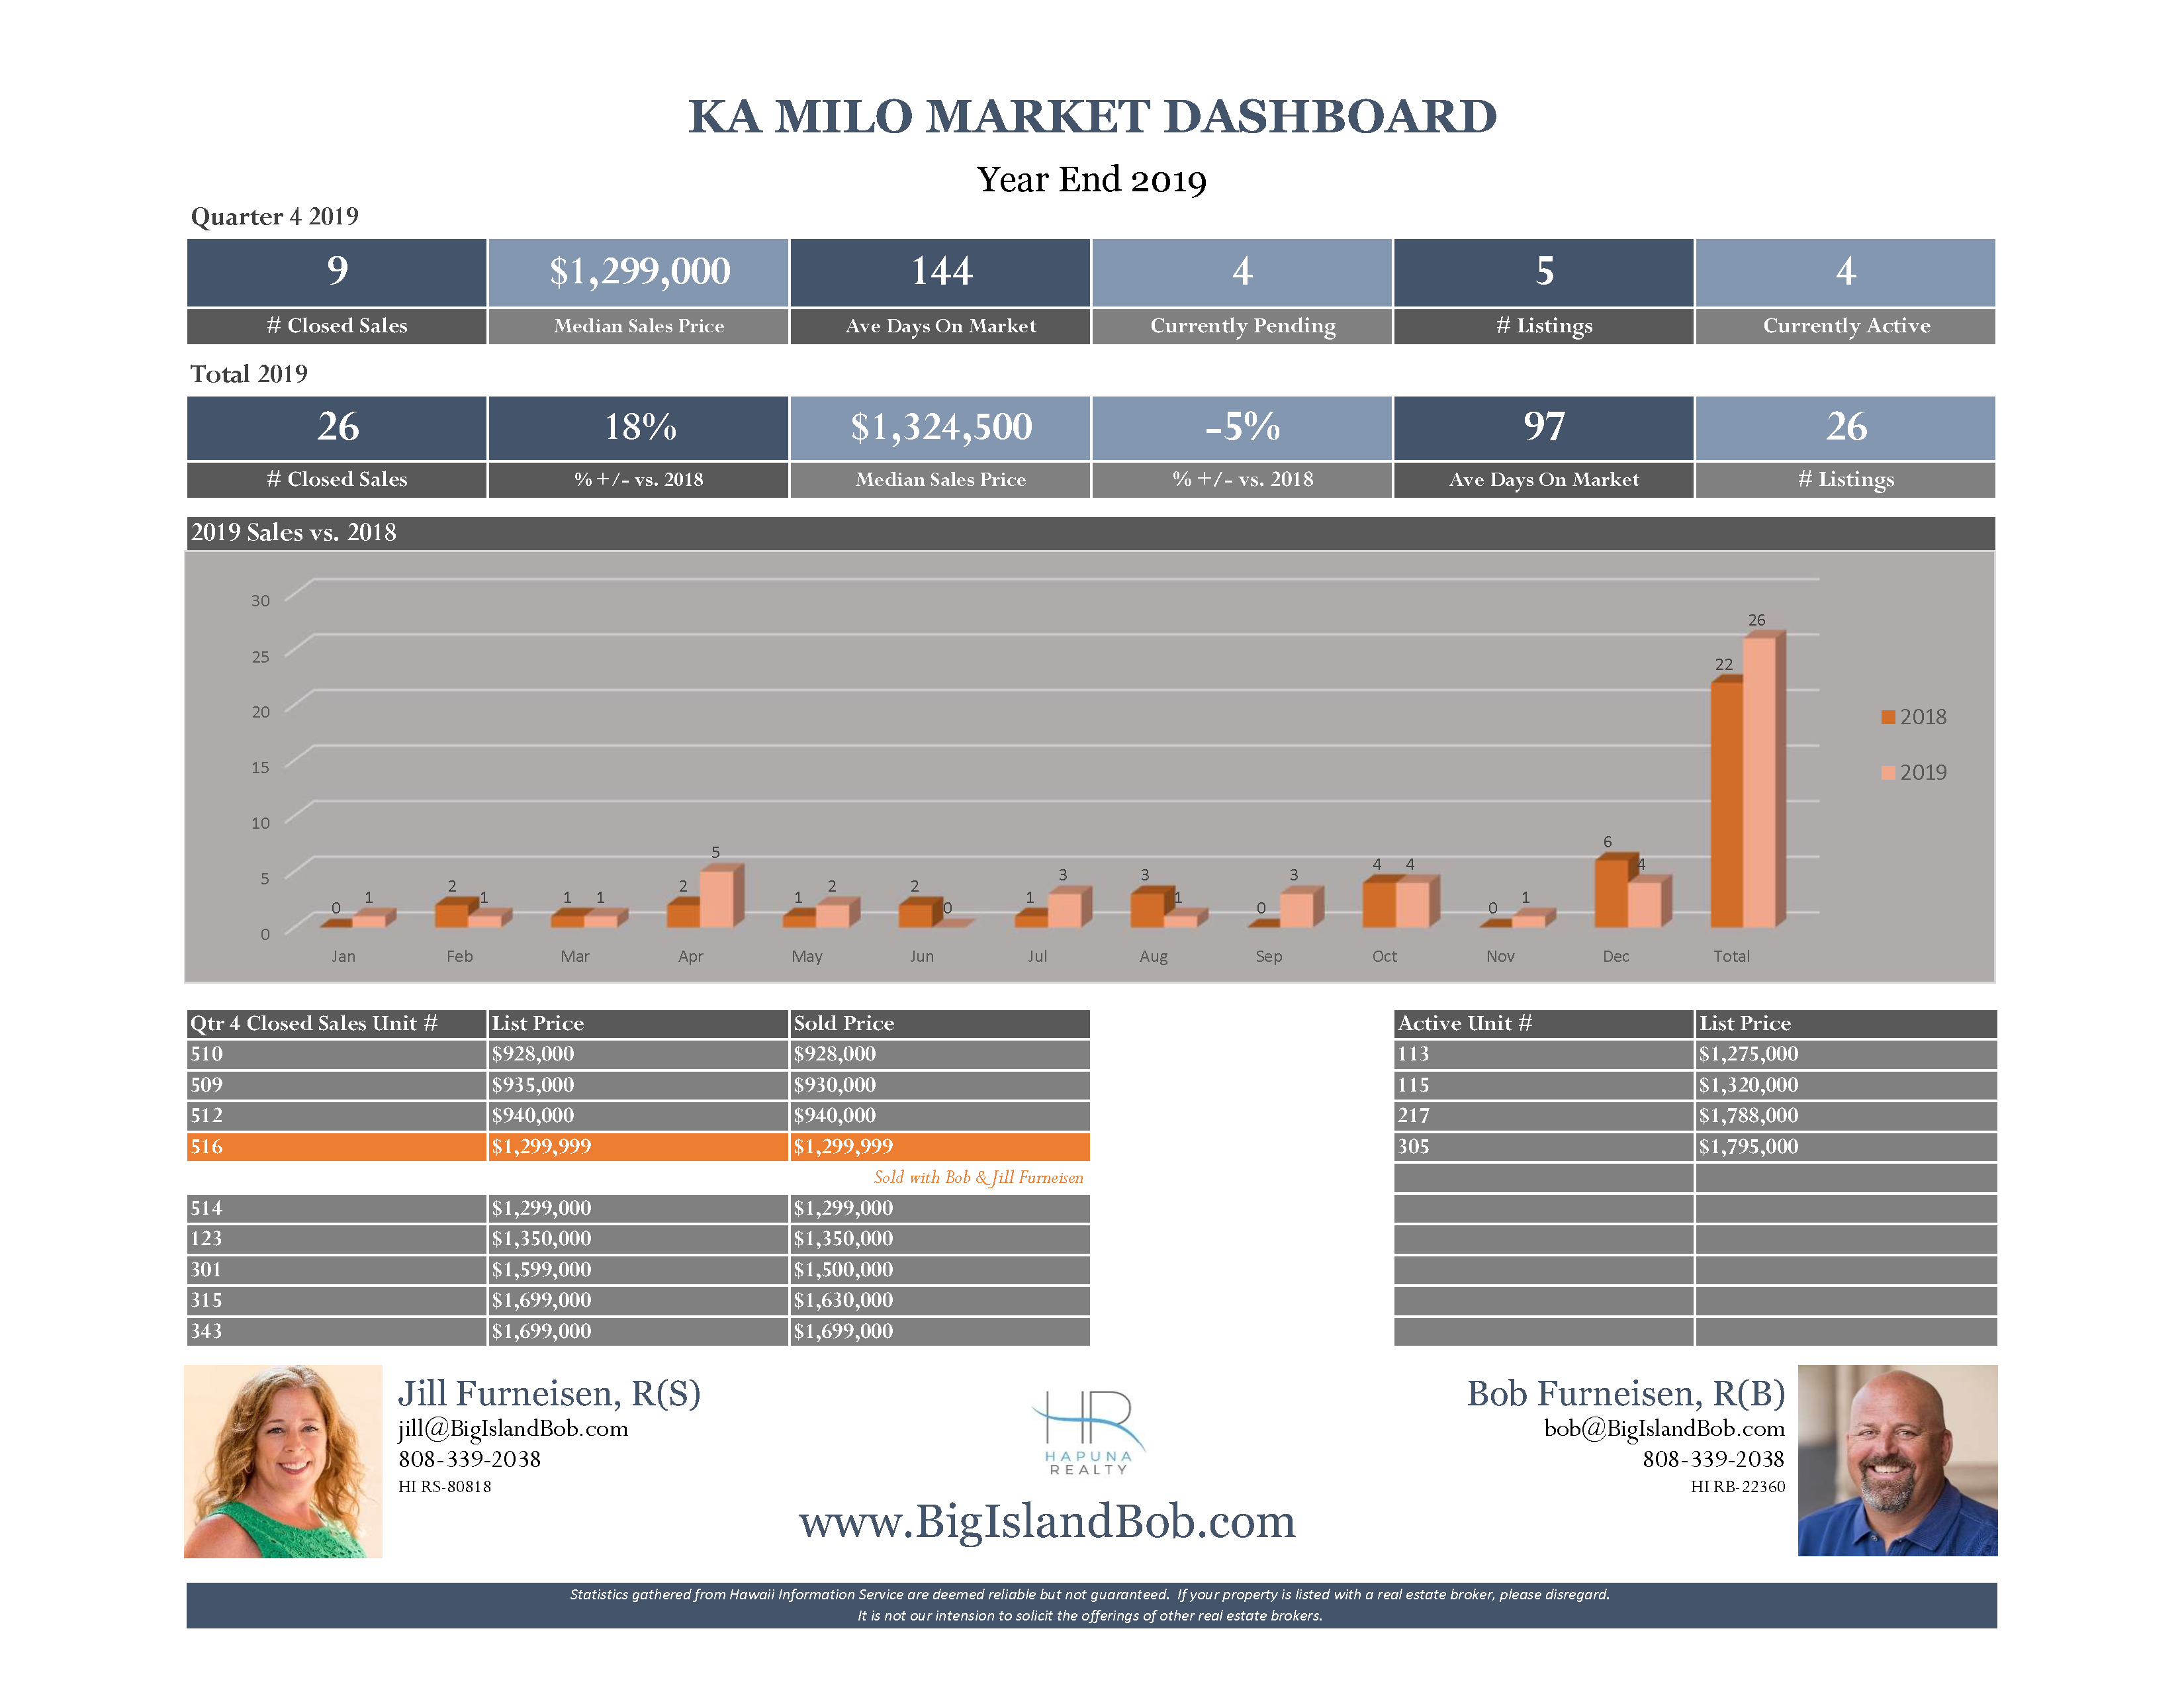 Ka Milo at Mauna Lani Year End 2019 Real Estate Market Dashboard